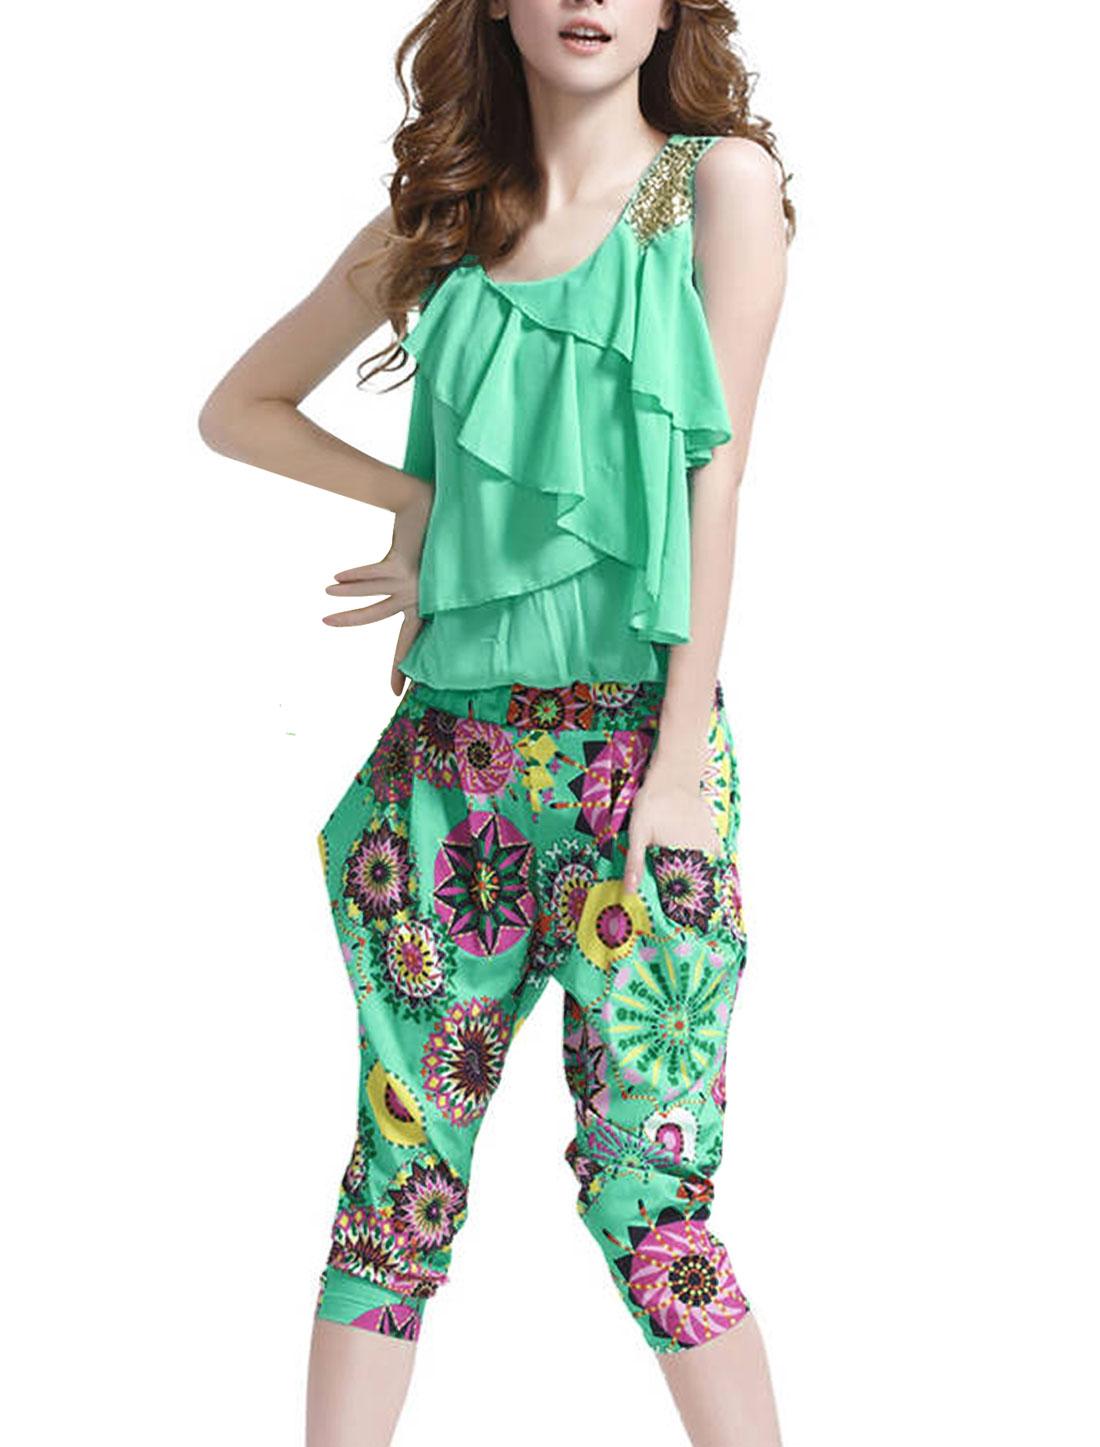 Ladies Chic Scoop Neck Tiered Ruffles Top Novelty Prints Mint Caprai Jumpsuit S